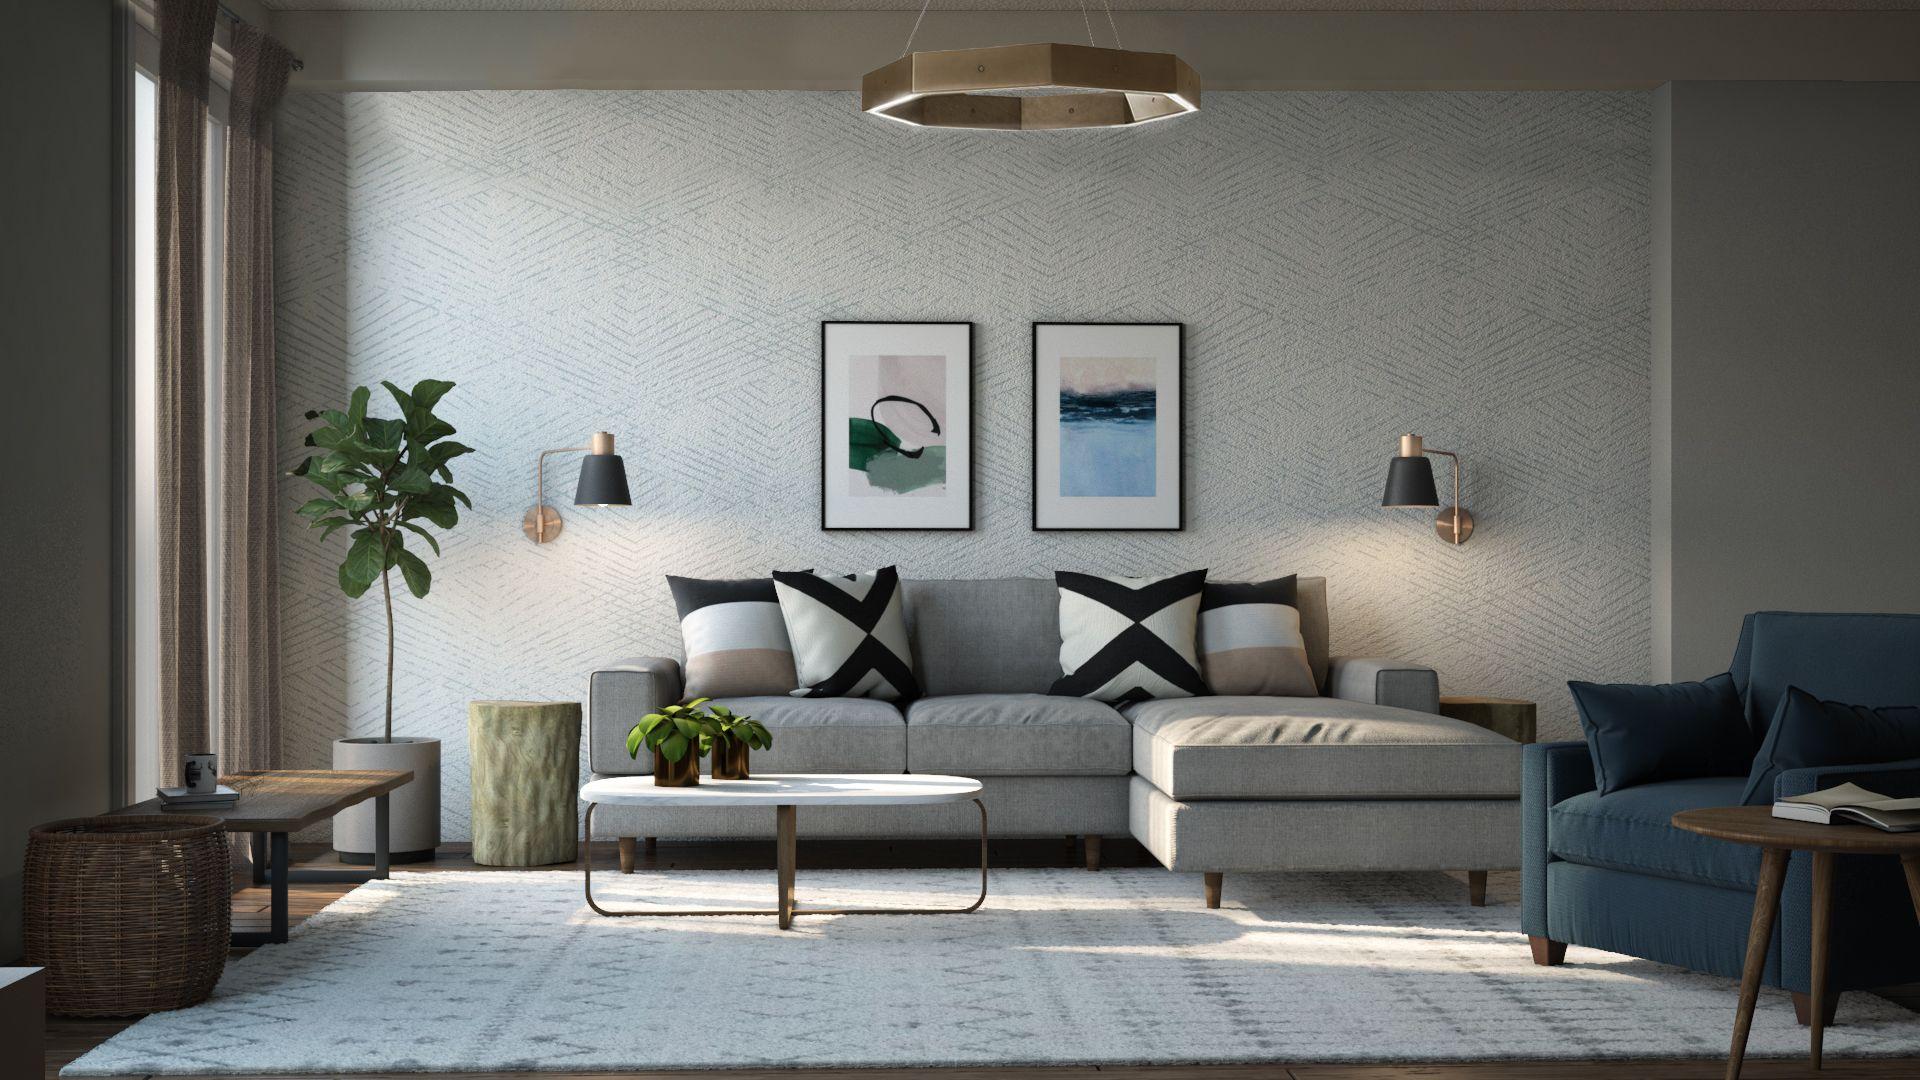 Online Interior Design And Home Inspiration Living Room